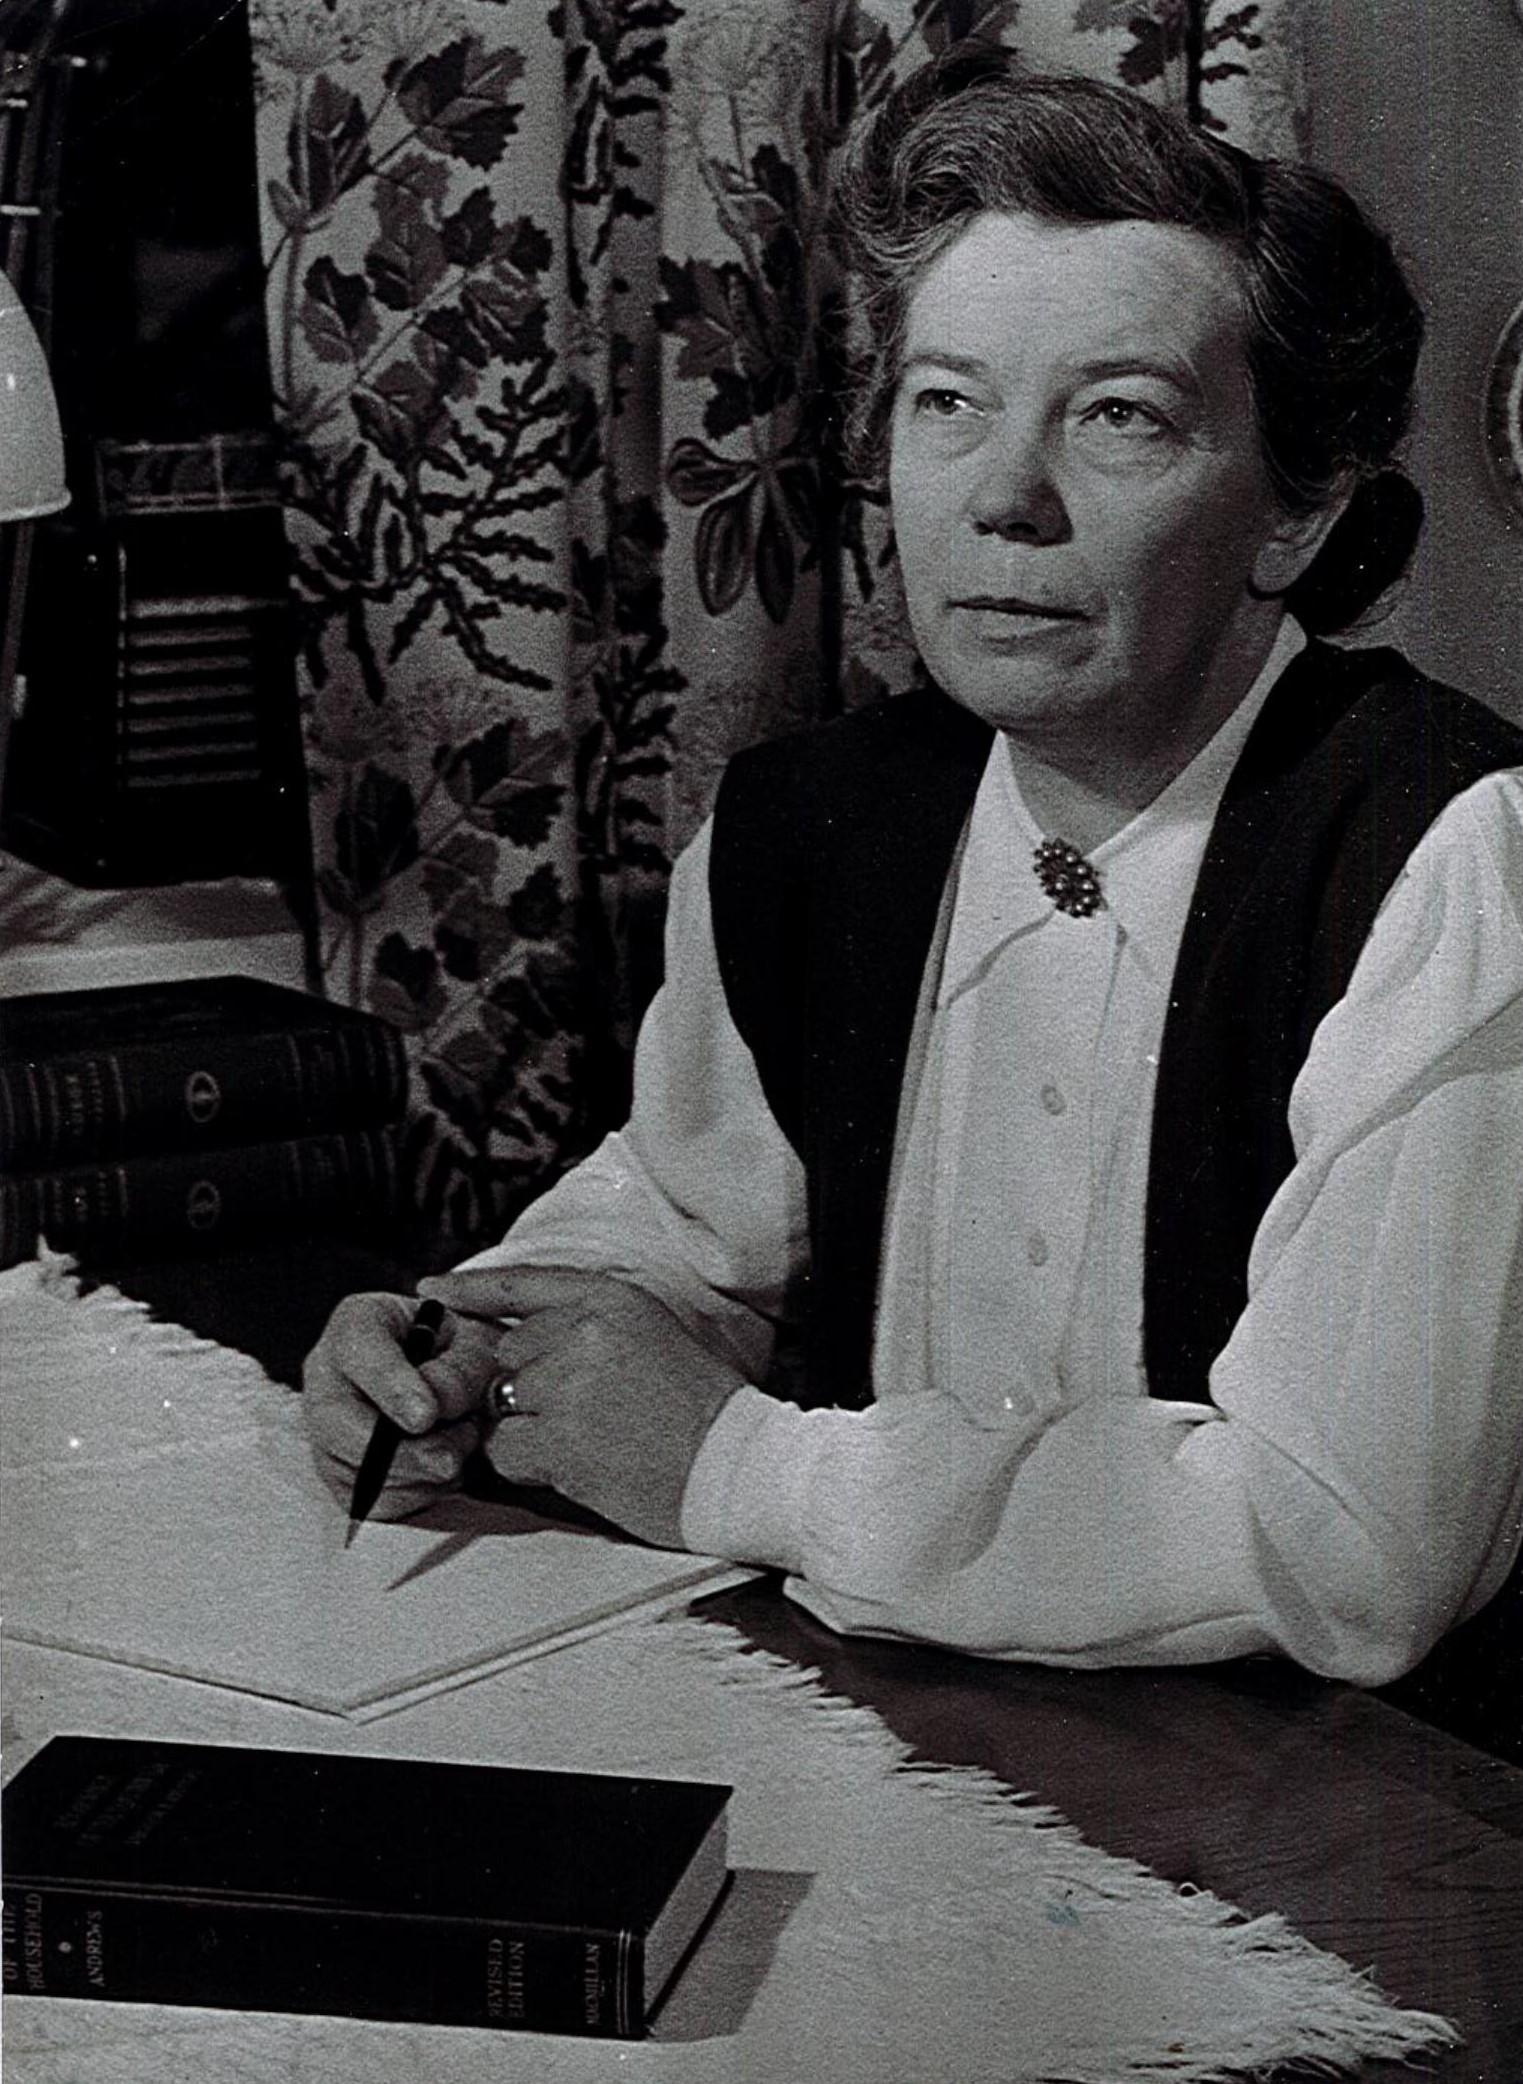 Kate Carpenter, circa 1950. Photo: Håwi Foto for ICA-Kuriren (privately owned image)